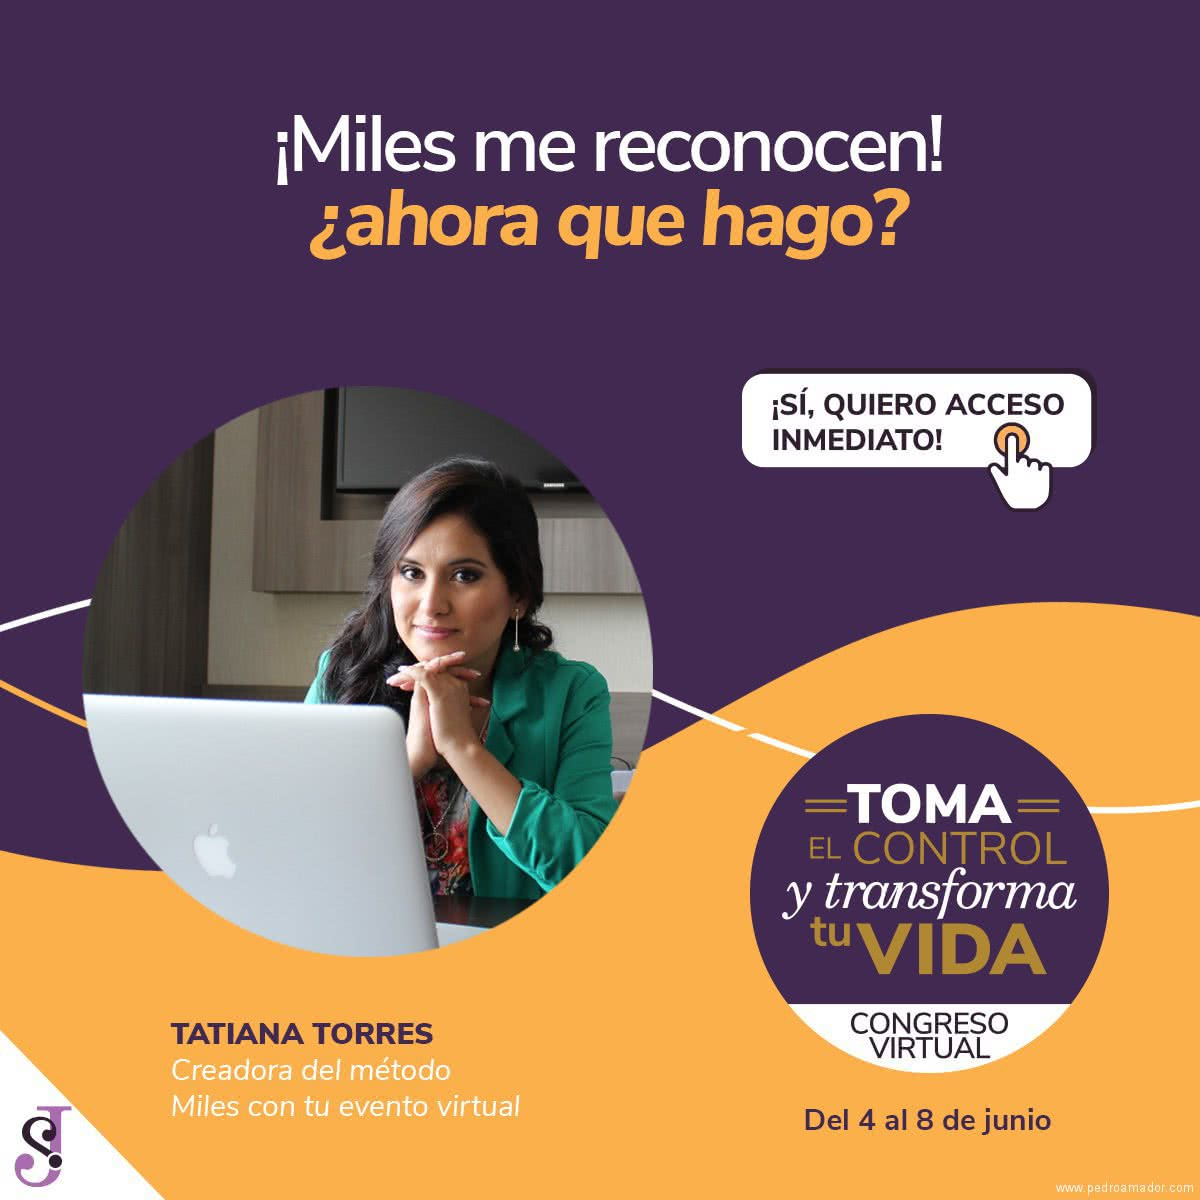 Transforma tu vida - Tatiana Torres